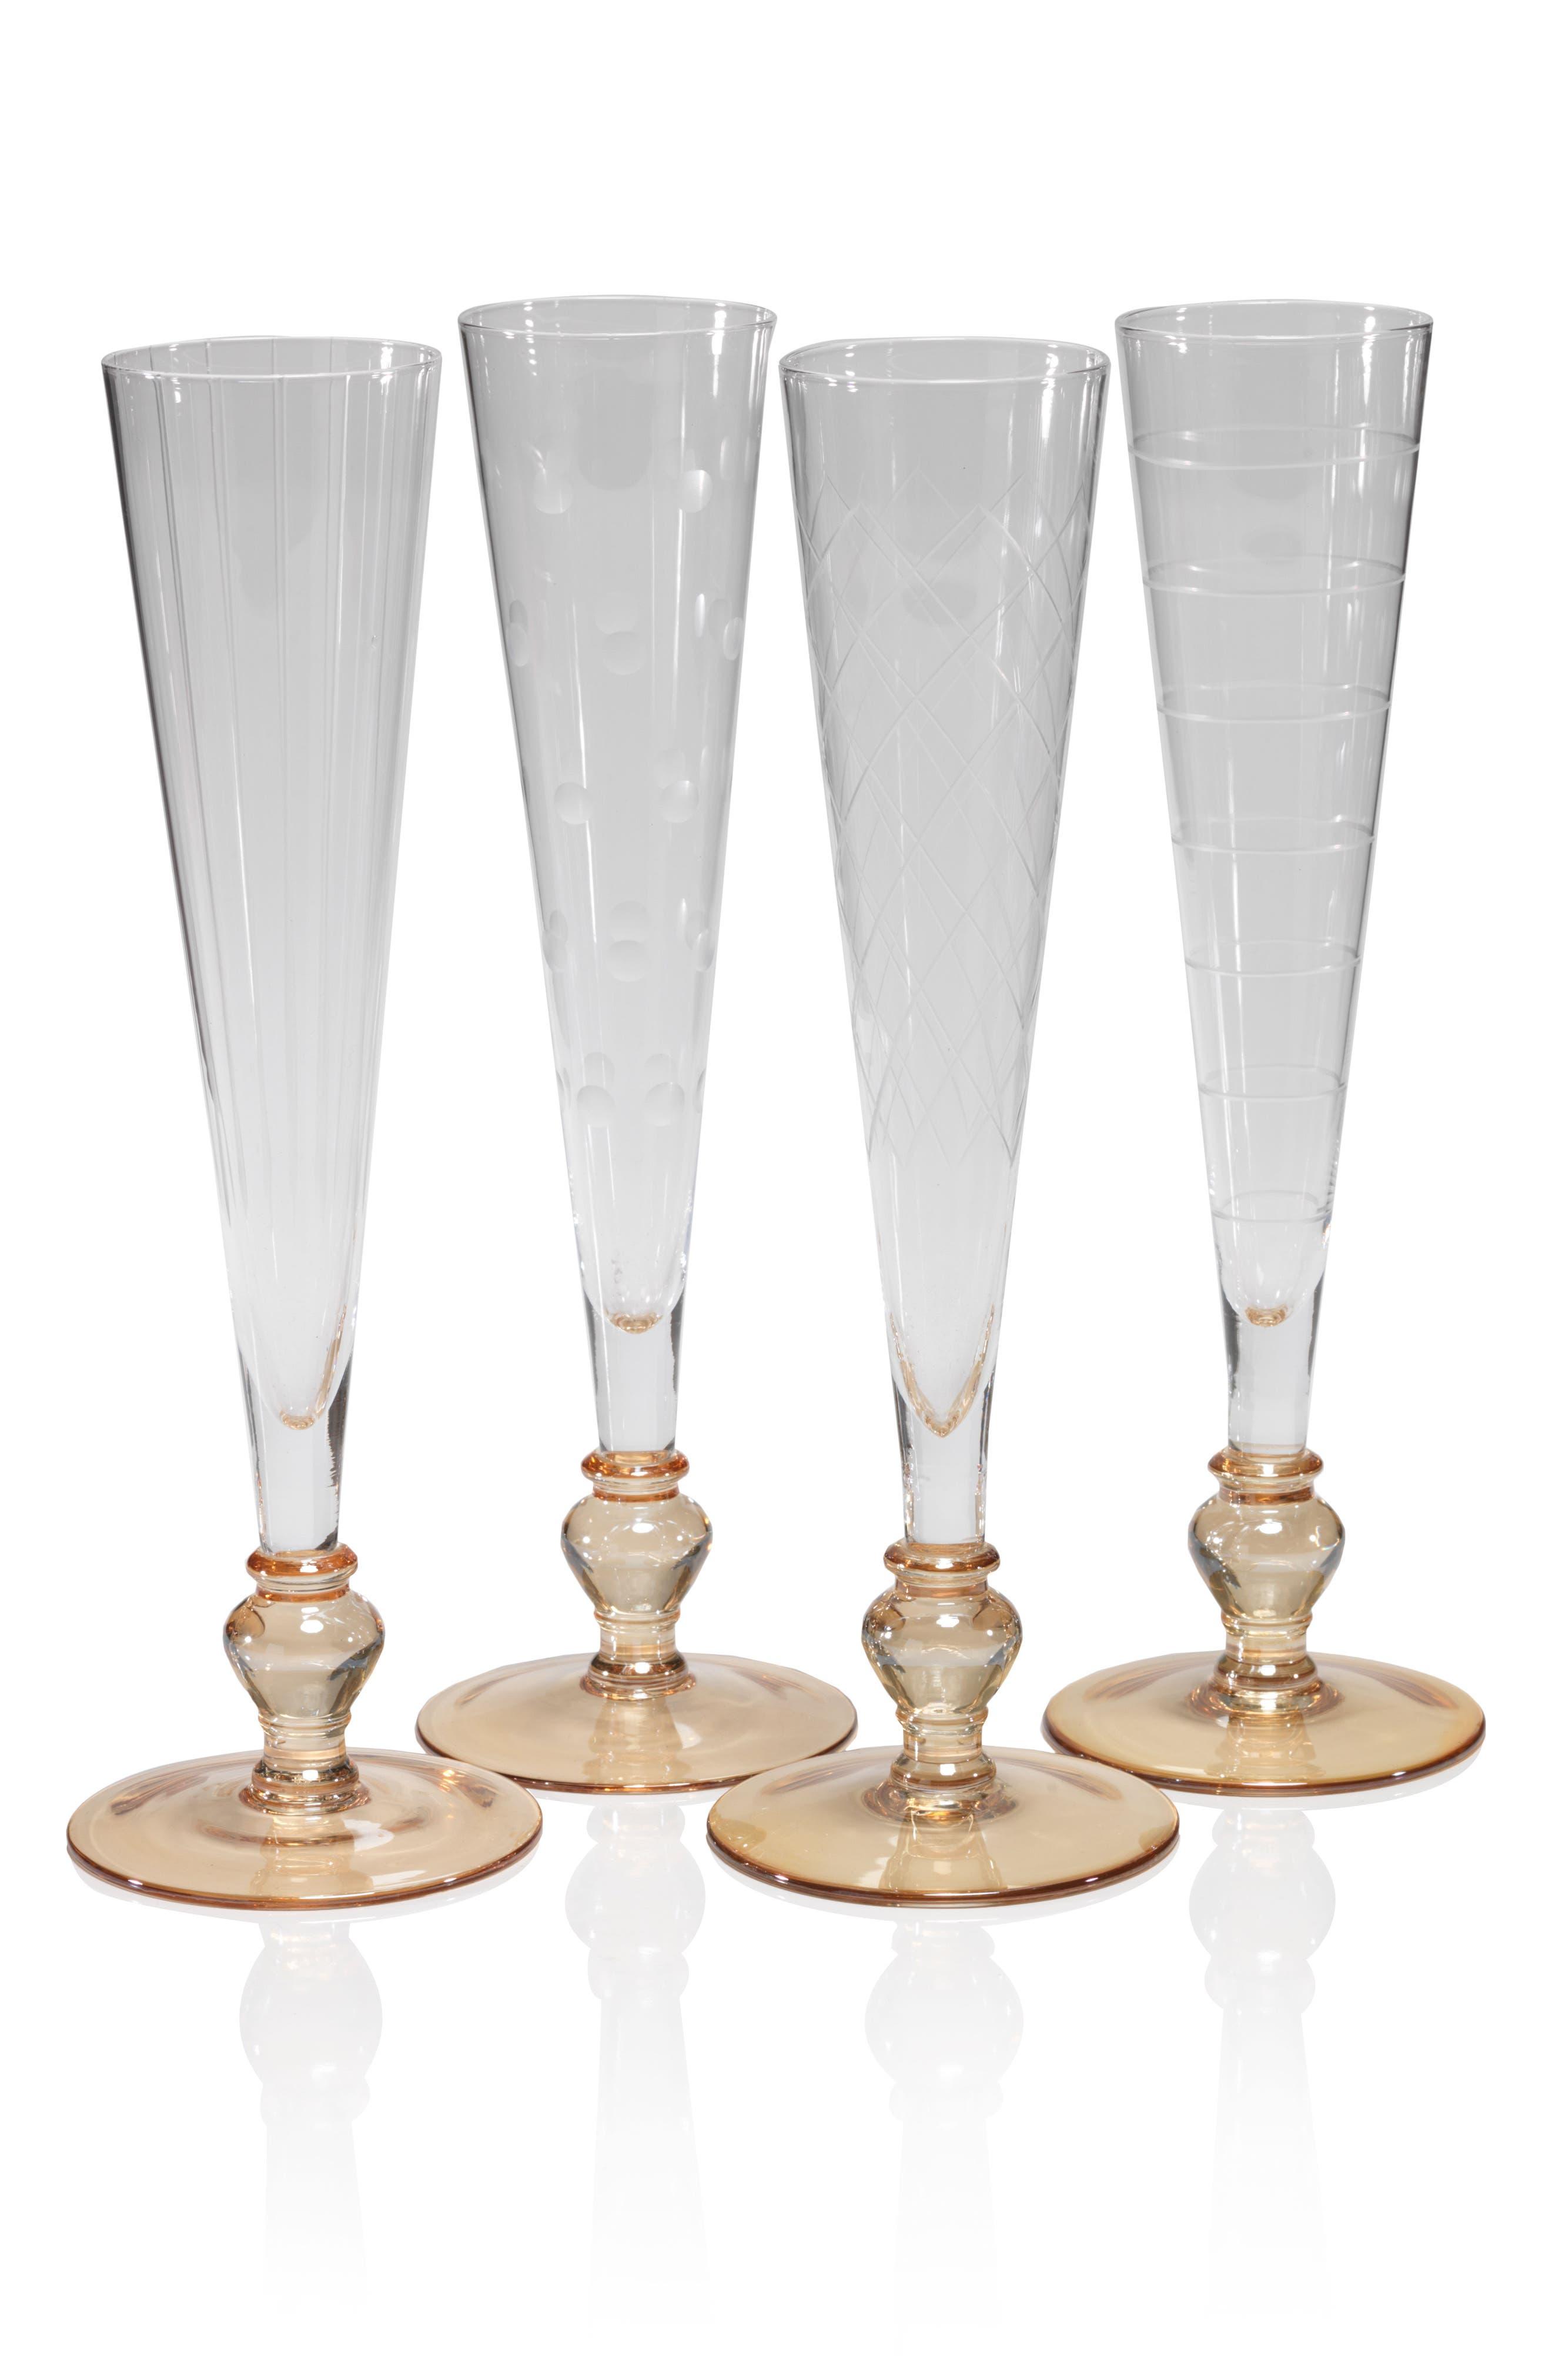 Main Image - Zodax Tatiana Set of 4 Champagne Flutes